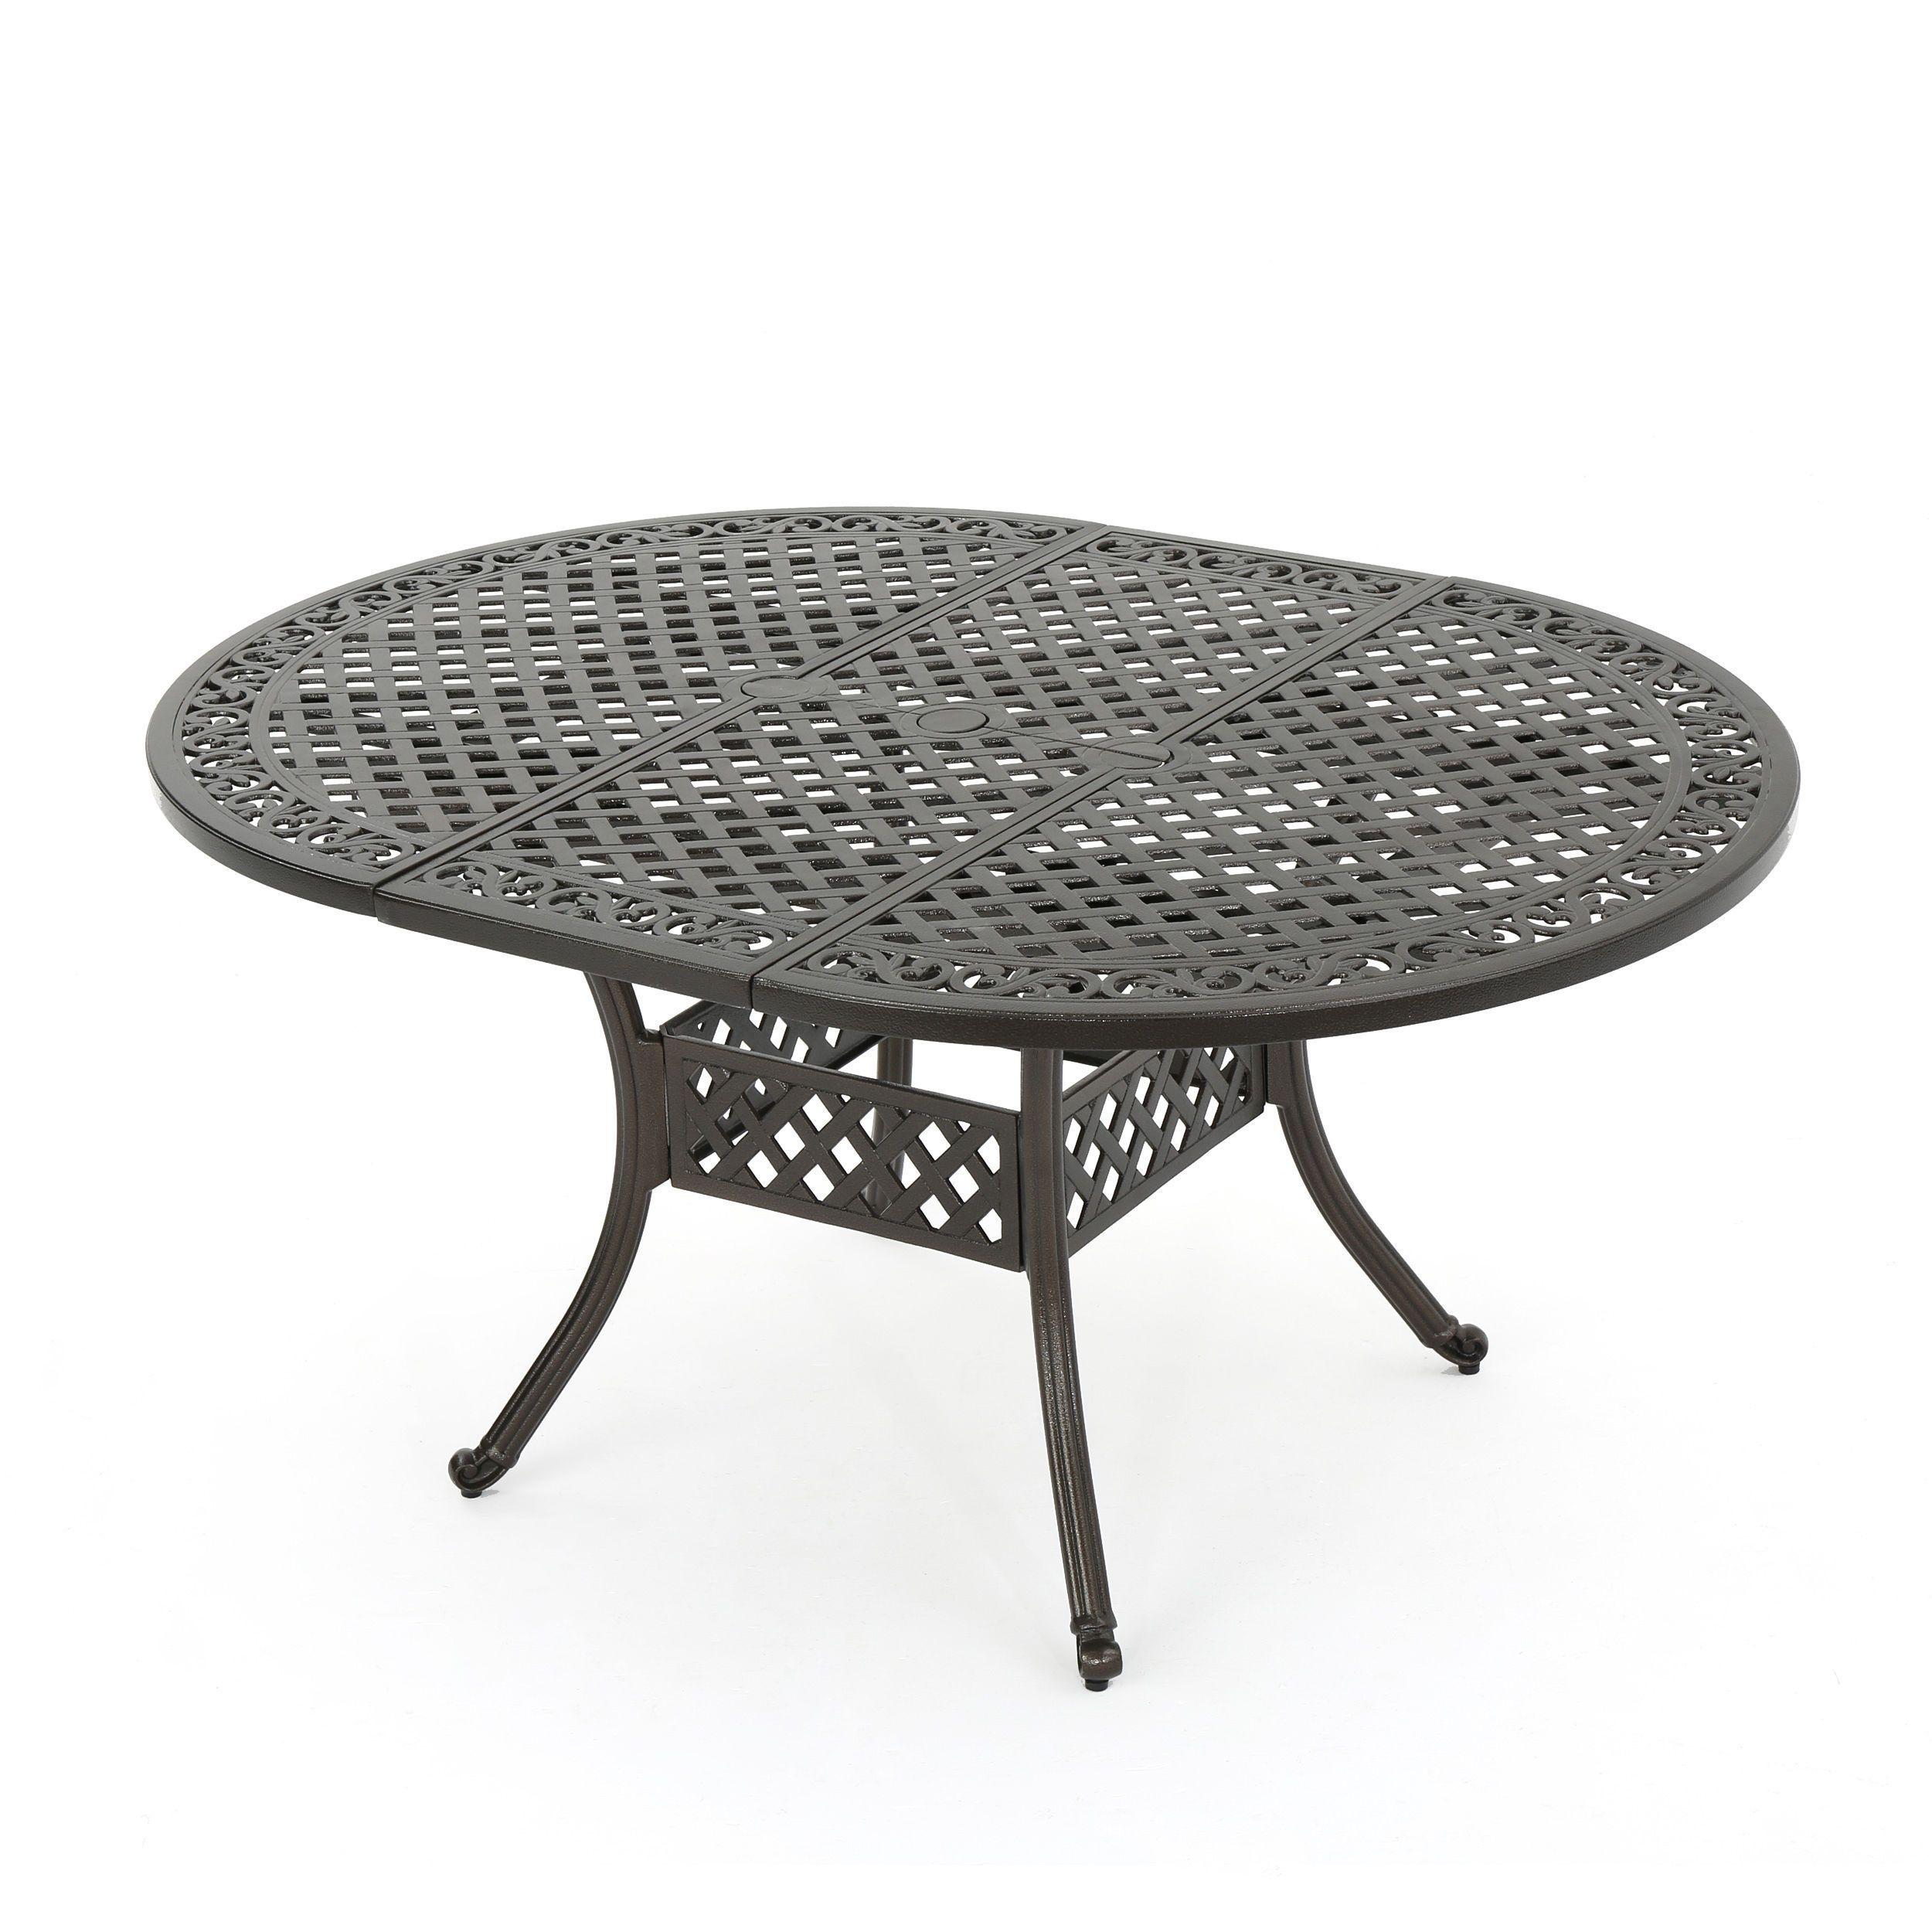 Rabinyod Bulan Gray White Coffee Table Weather Outdoor Patio Garden Furniture Sofa Set